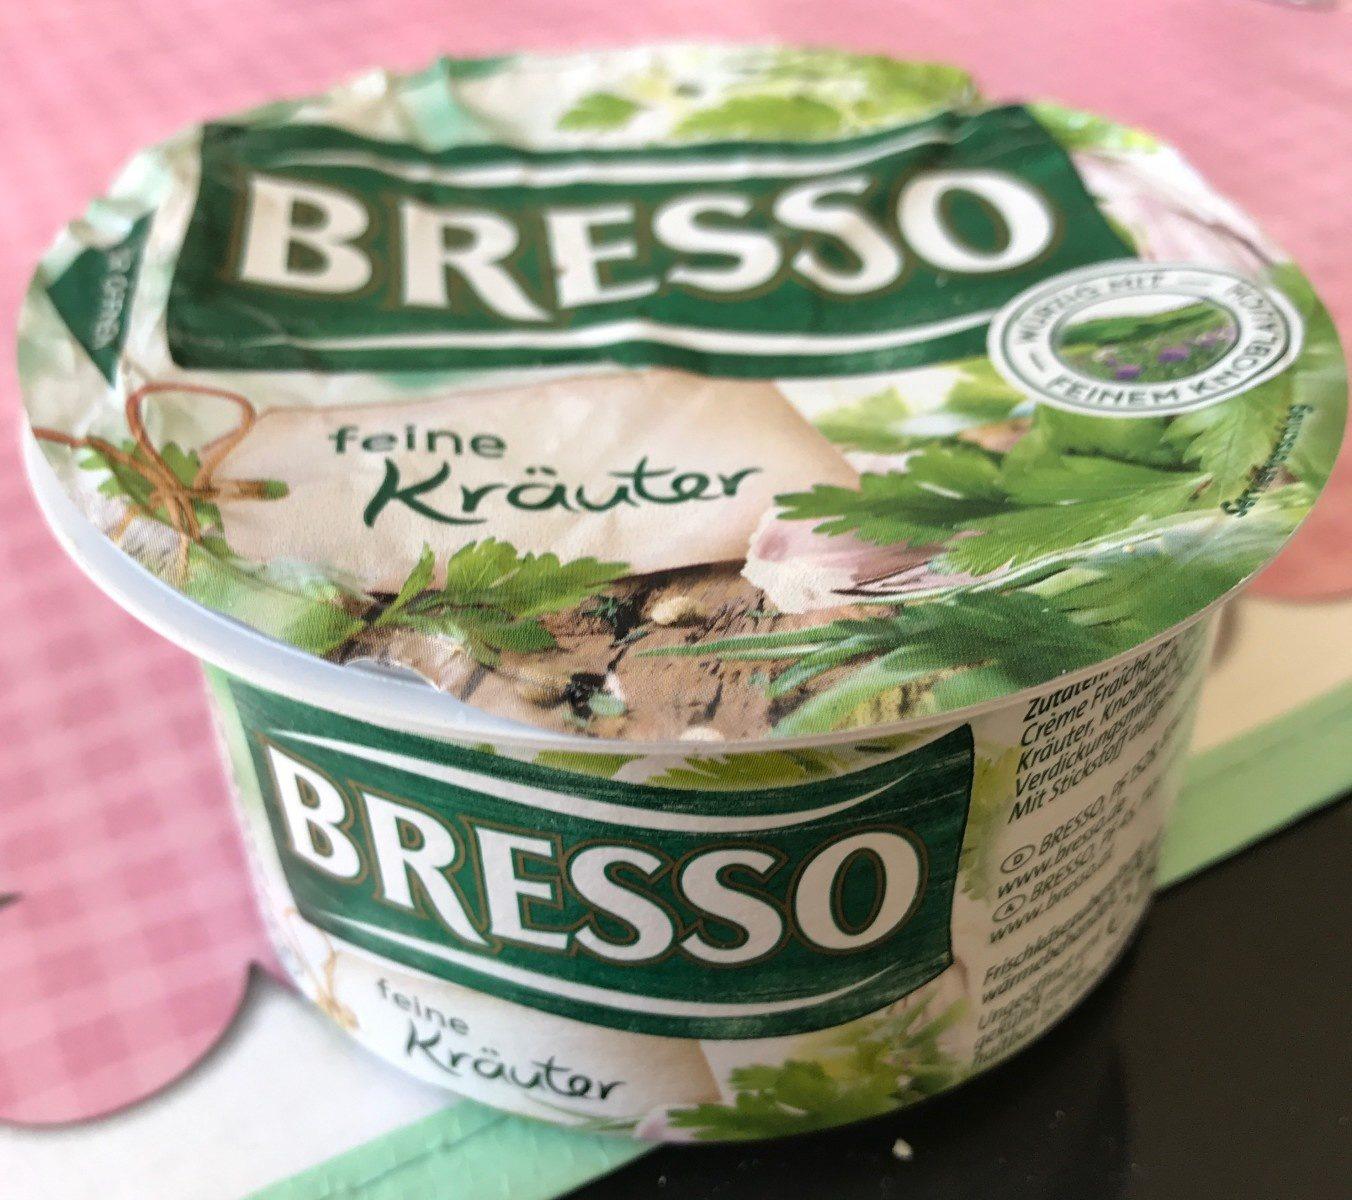 Bresso Feine Kräuter - Produit